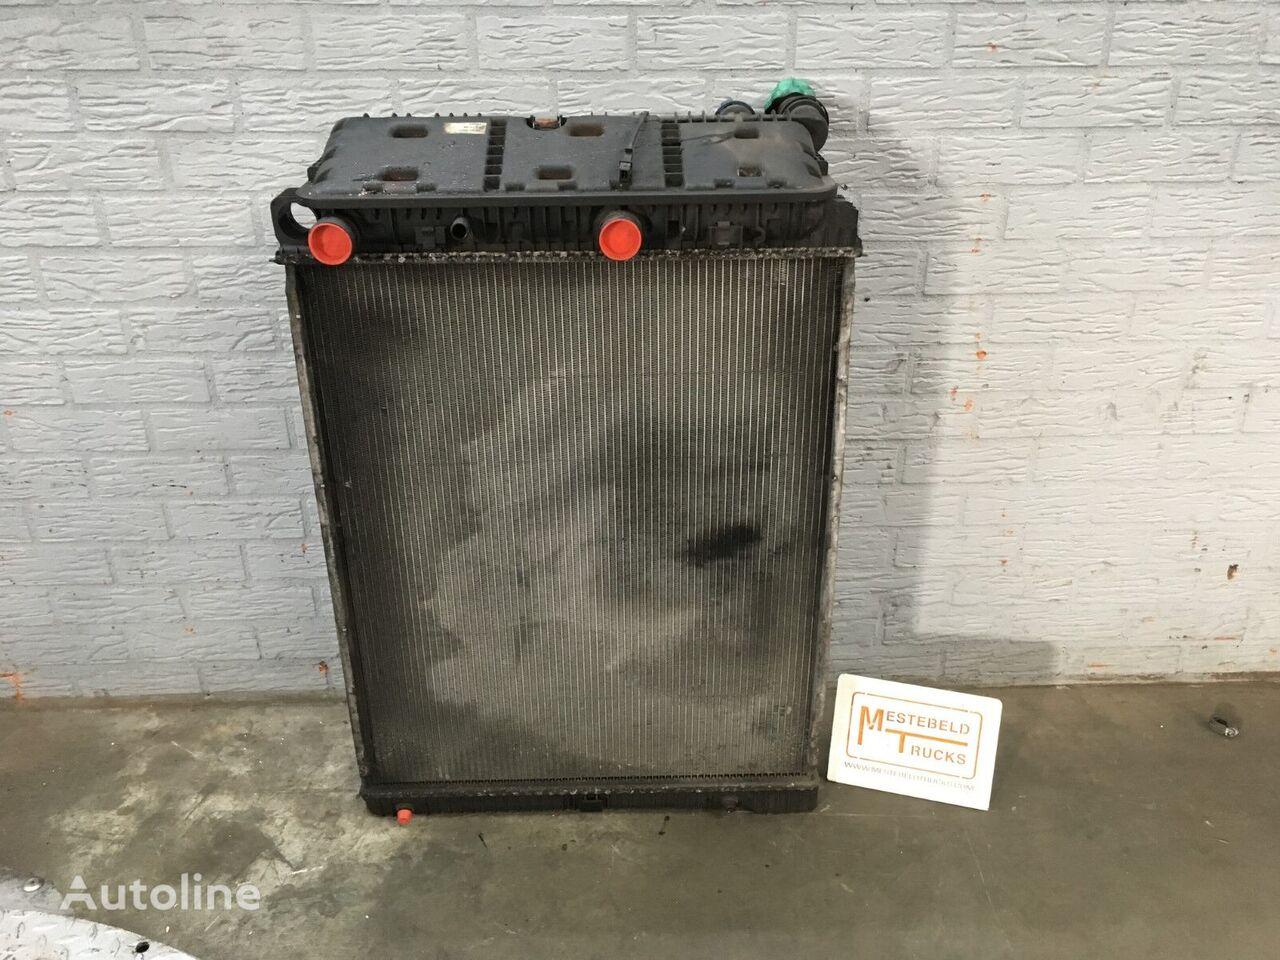 MERCEDES-BENZ Radiateur engine cooling radiator for MERCEDES-BENZ Actros/Axor truck